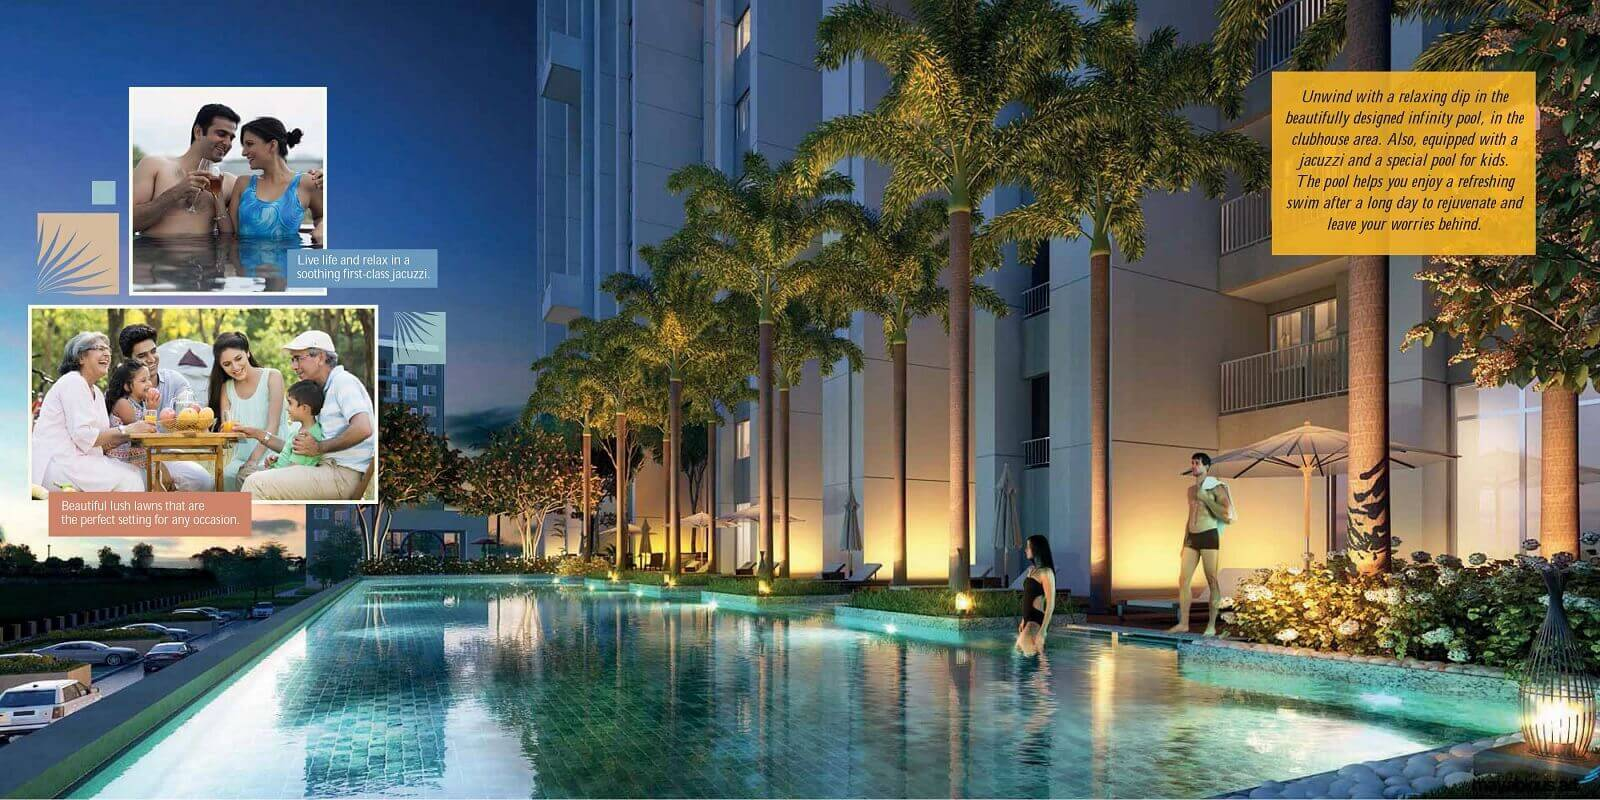 emami tejomaya amenities features1